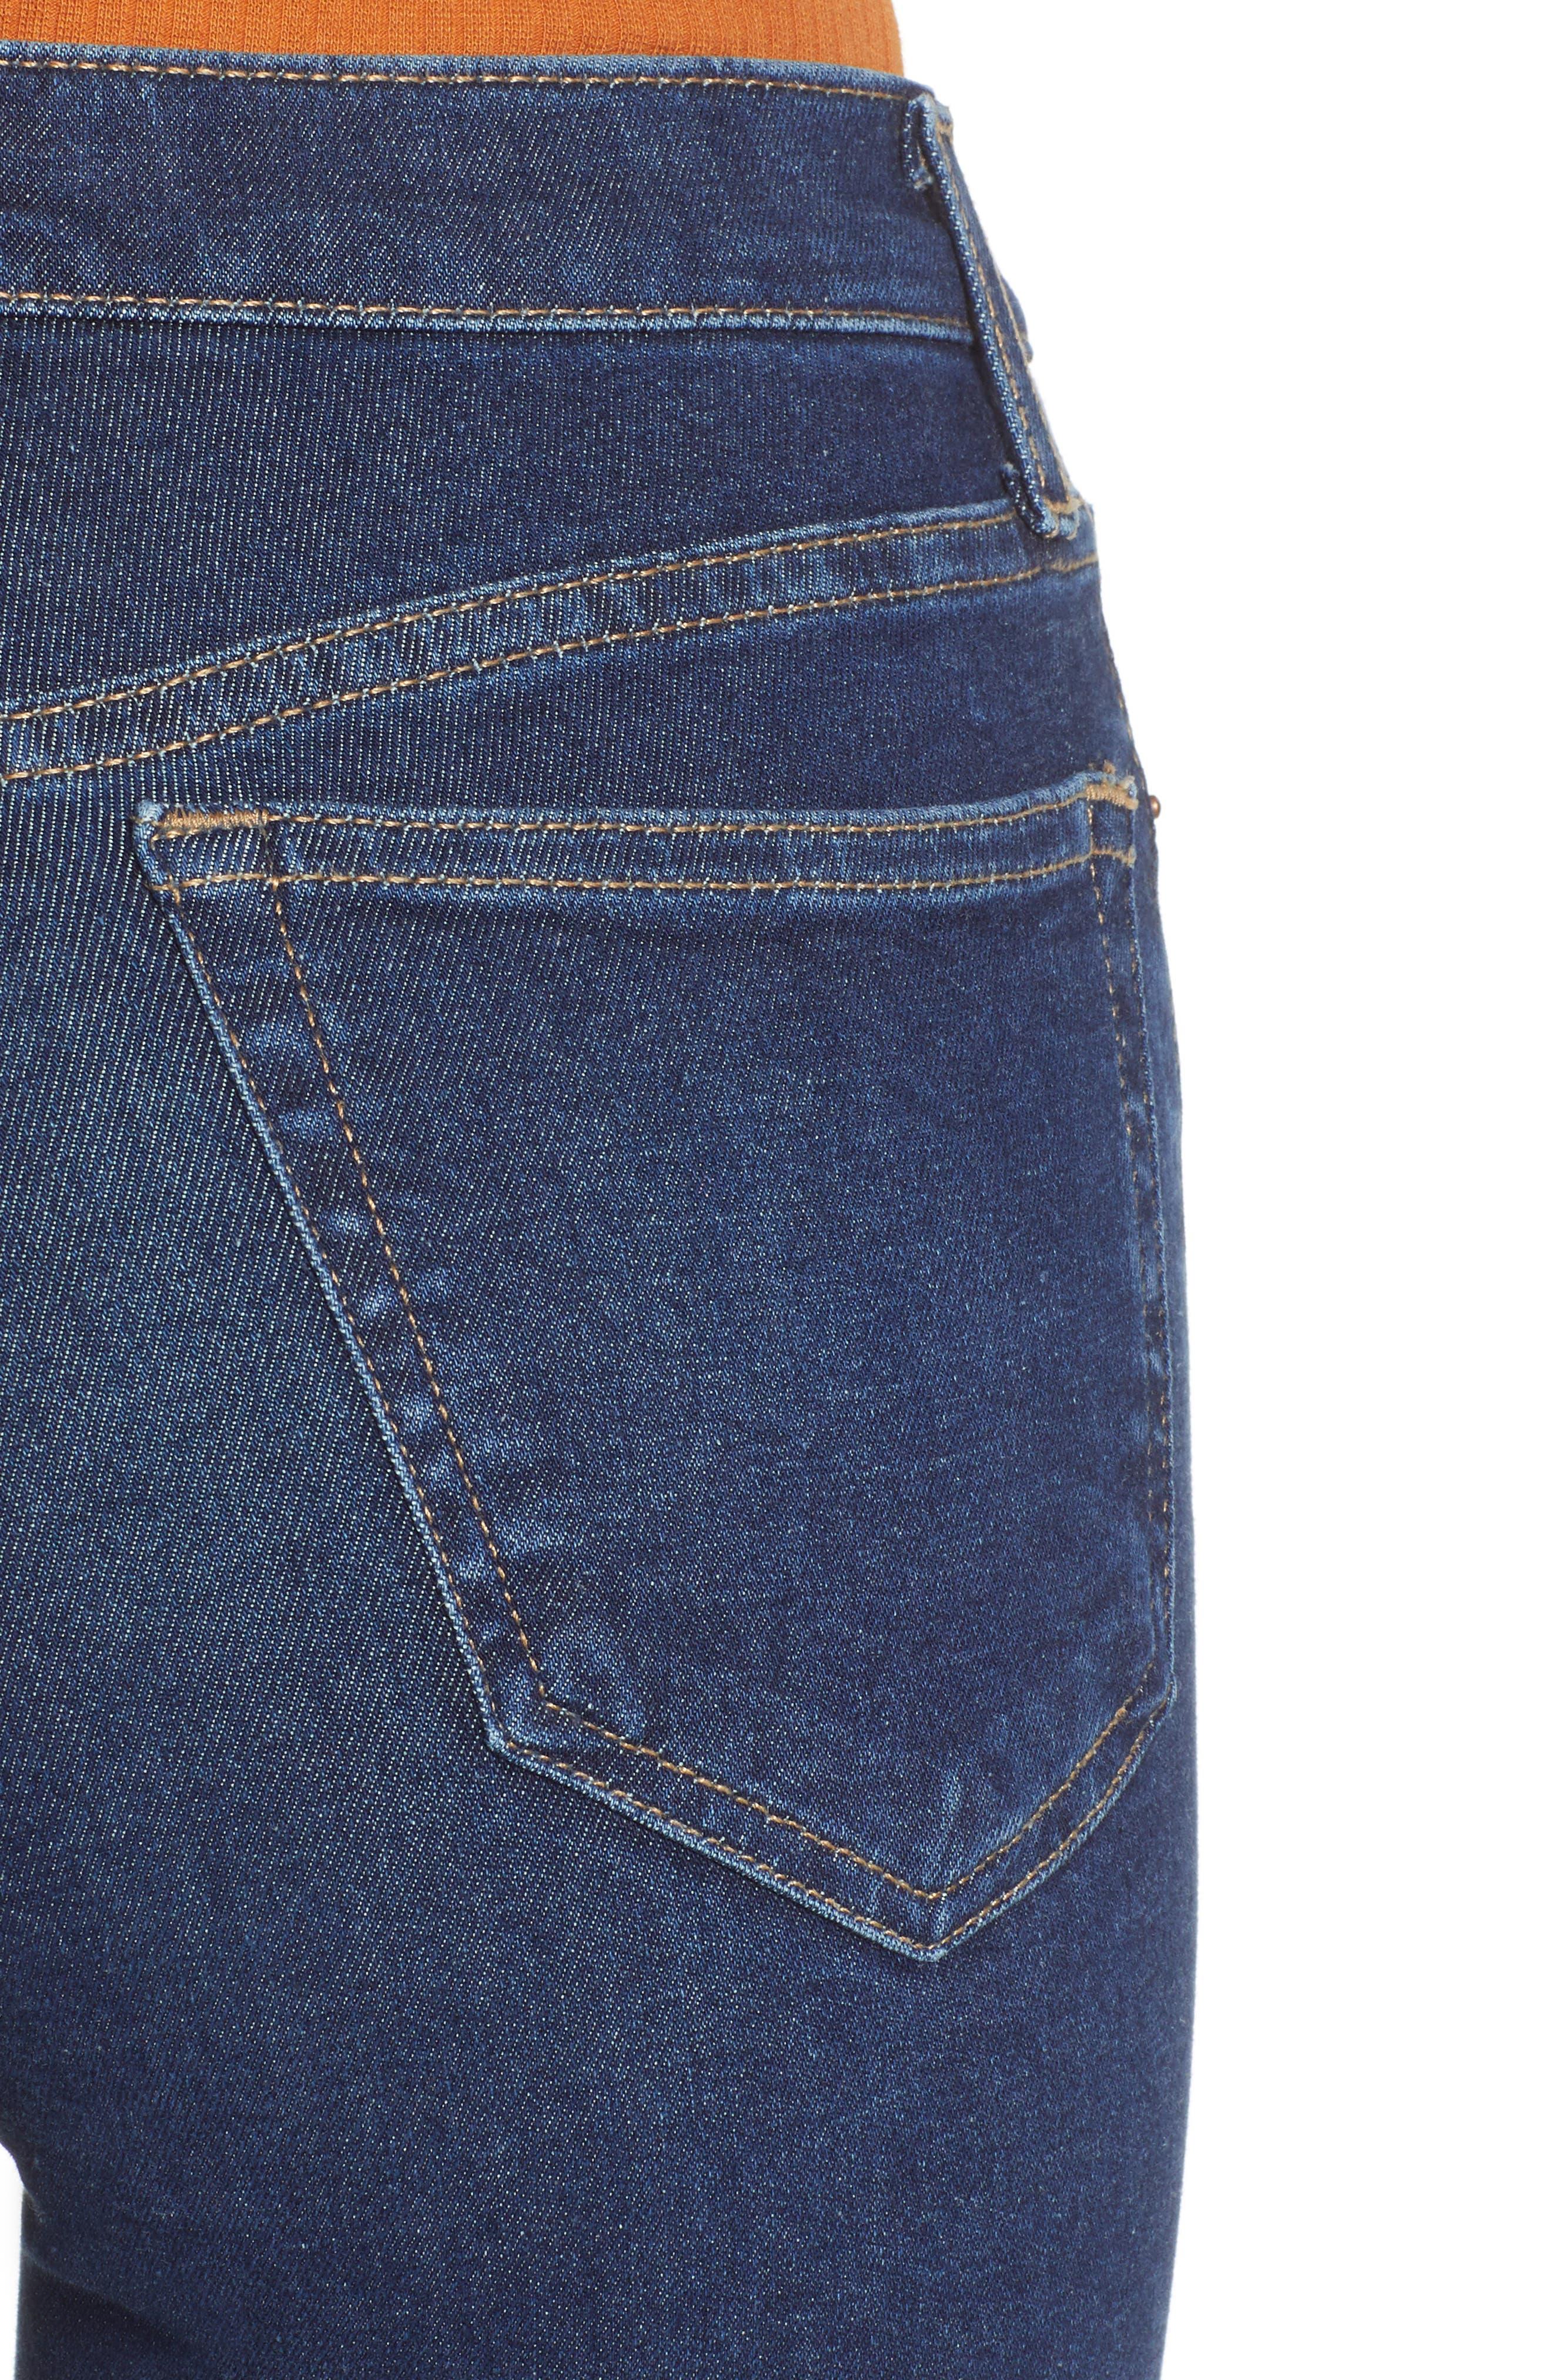 TOPSHOP, MOTO Jamie High Waist Skinny Jeans, Alternate thumbnail 5, color, INDIGO